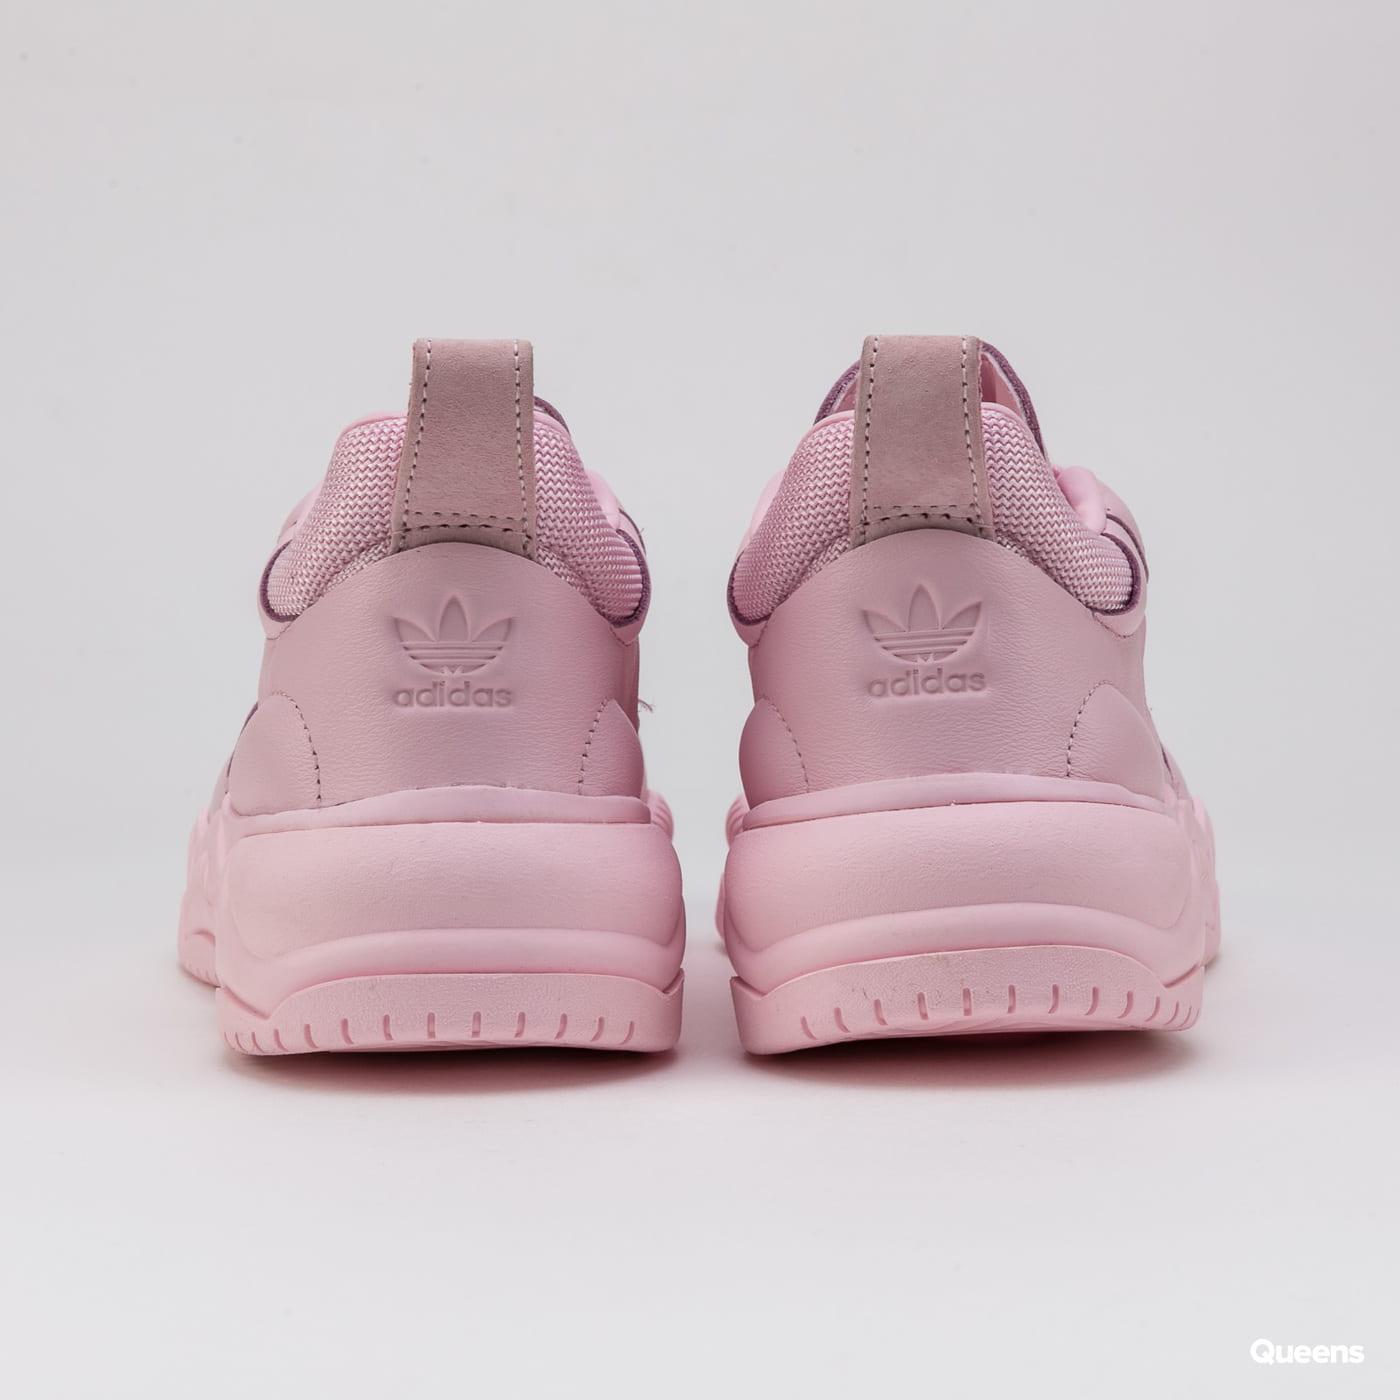 adidas Originals Supercourt RX W clpink / clpink / clpink